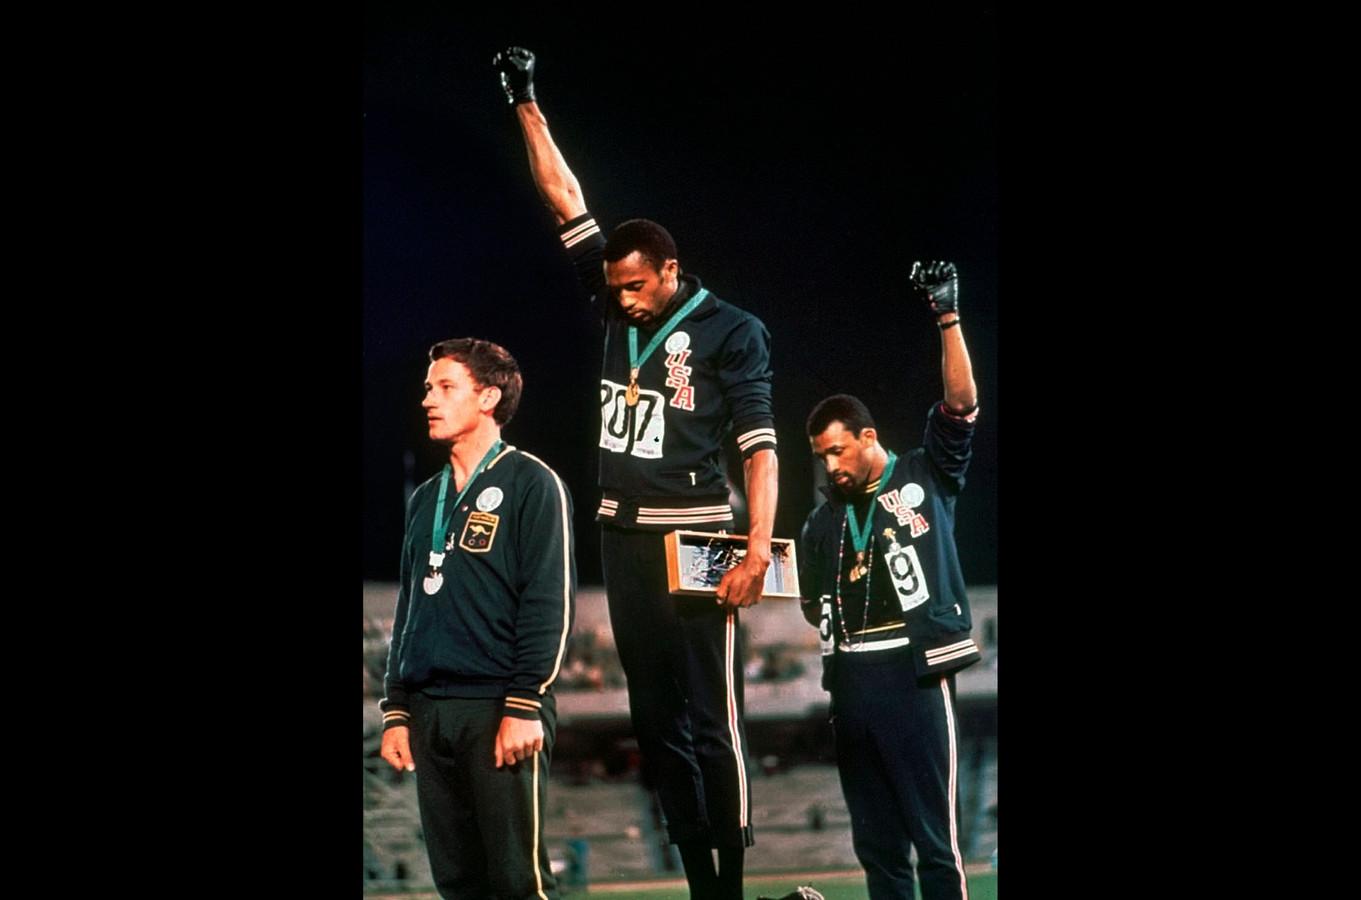 Tommie Smith en John Carlos (rechts) met de Black Power-vuist.